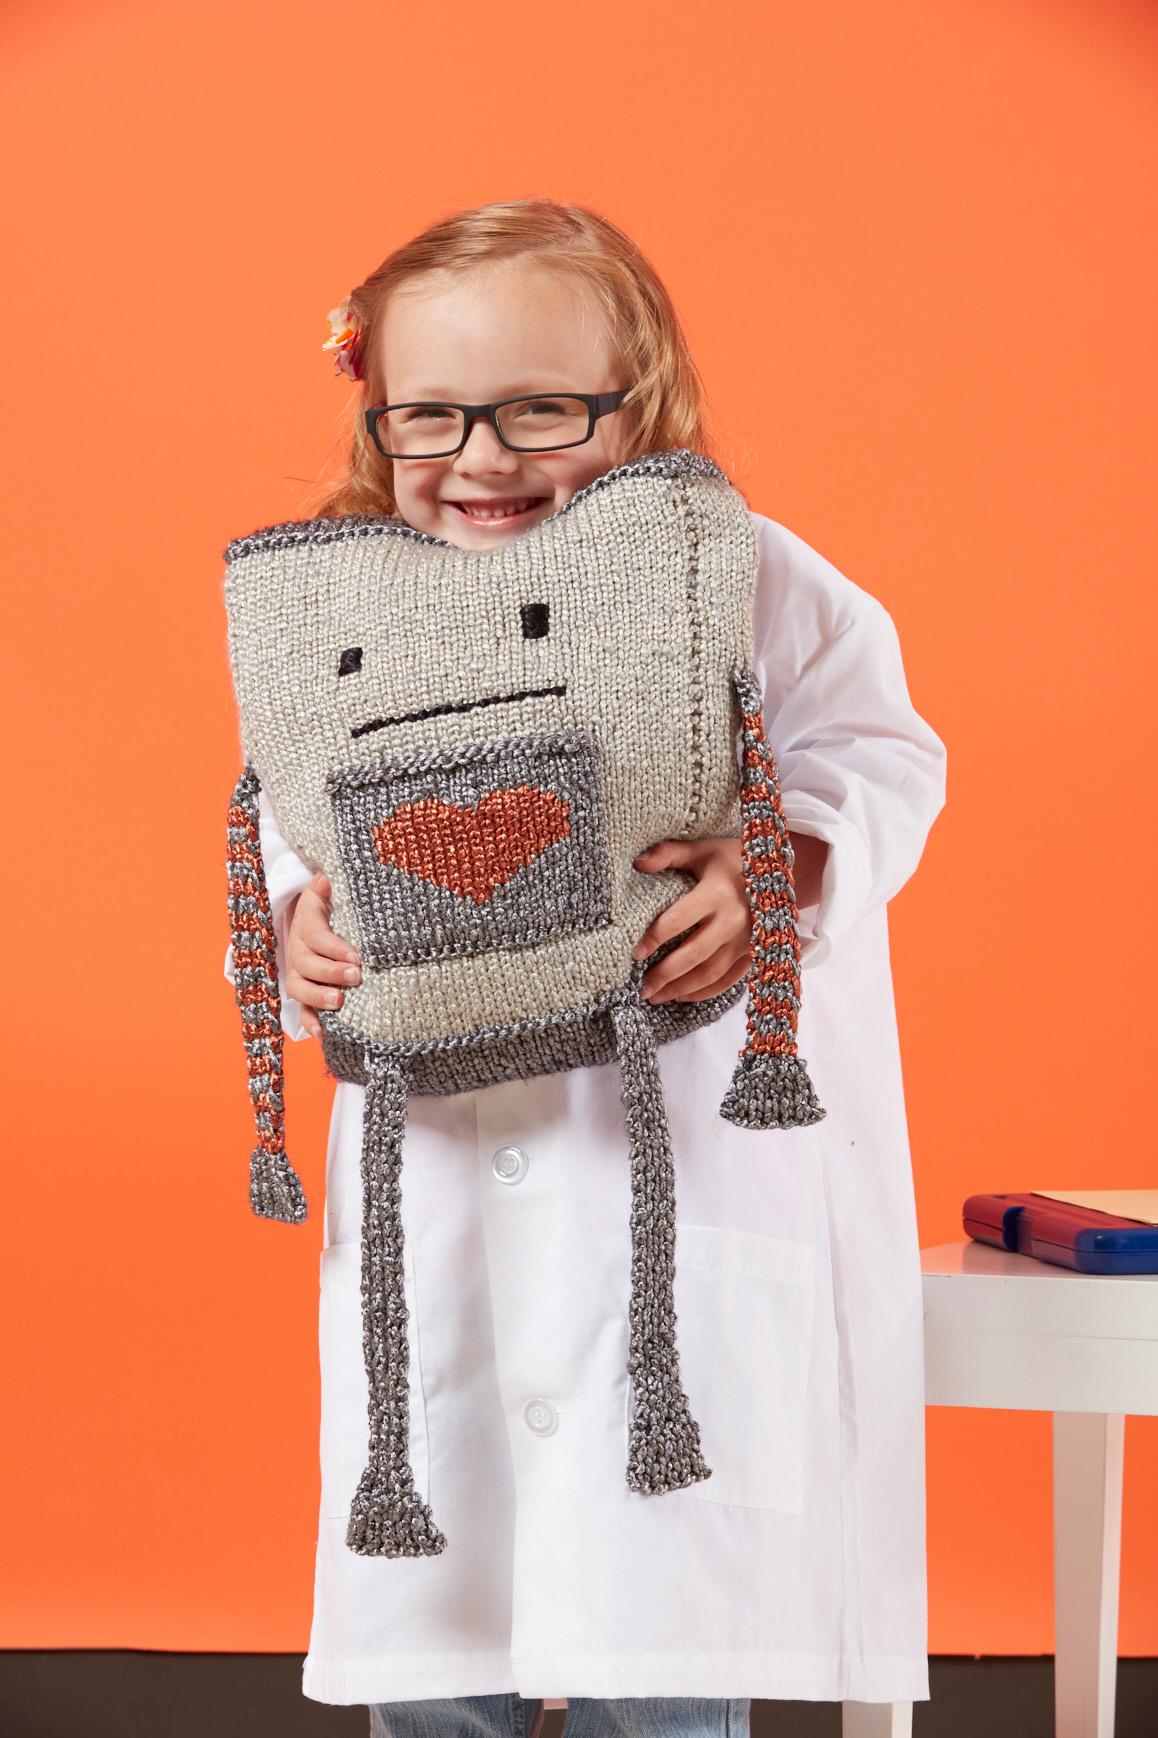 Mr. Robotics knitting pattern from Love of Knitting Toys by Grace Akhrem